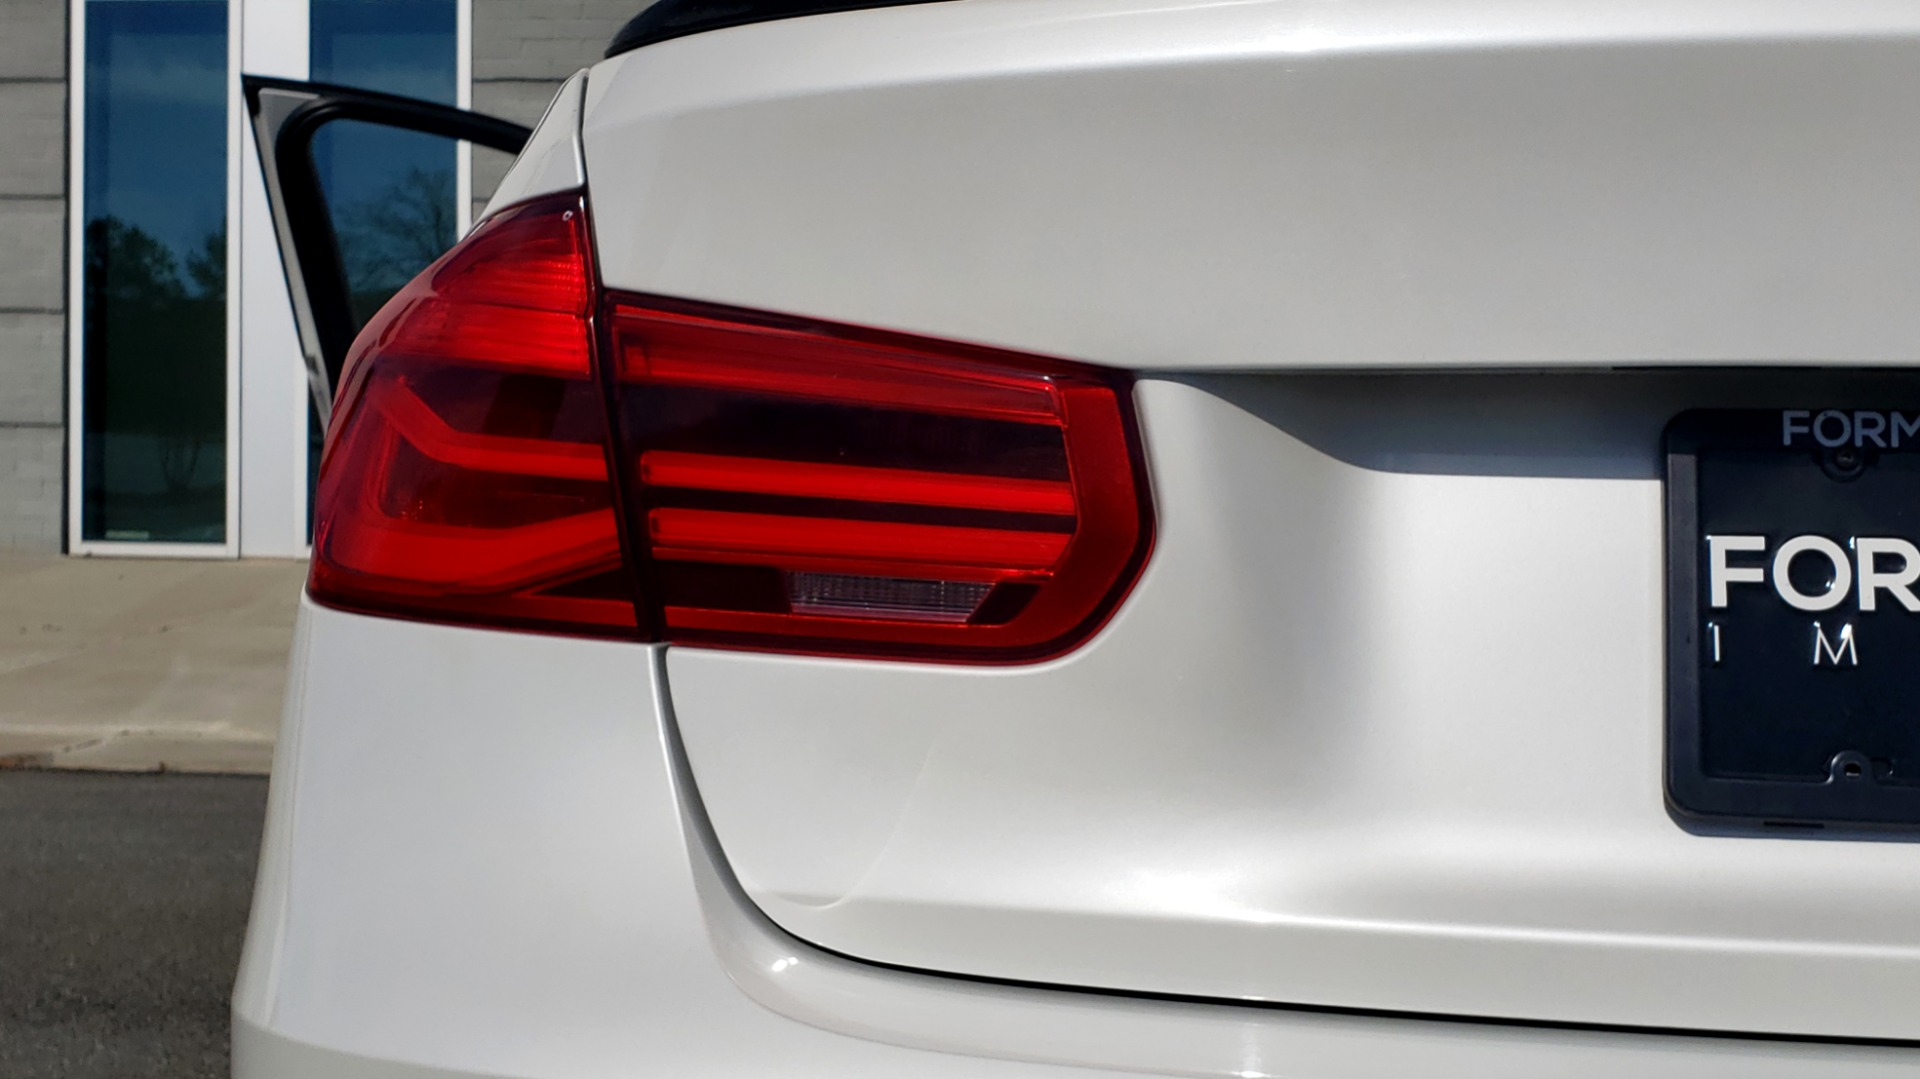 Used 2016 BMW M3 SEDAN / EXECUTIVE PKG / M-SUSPENSION / HARMAN/KARDON SOUND for sale Sold at Formula Imports in Charlotte NC 28227 32